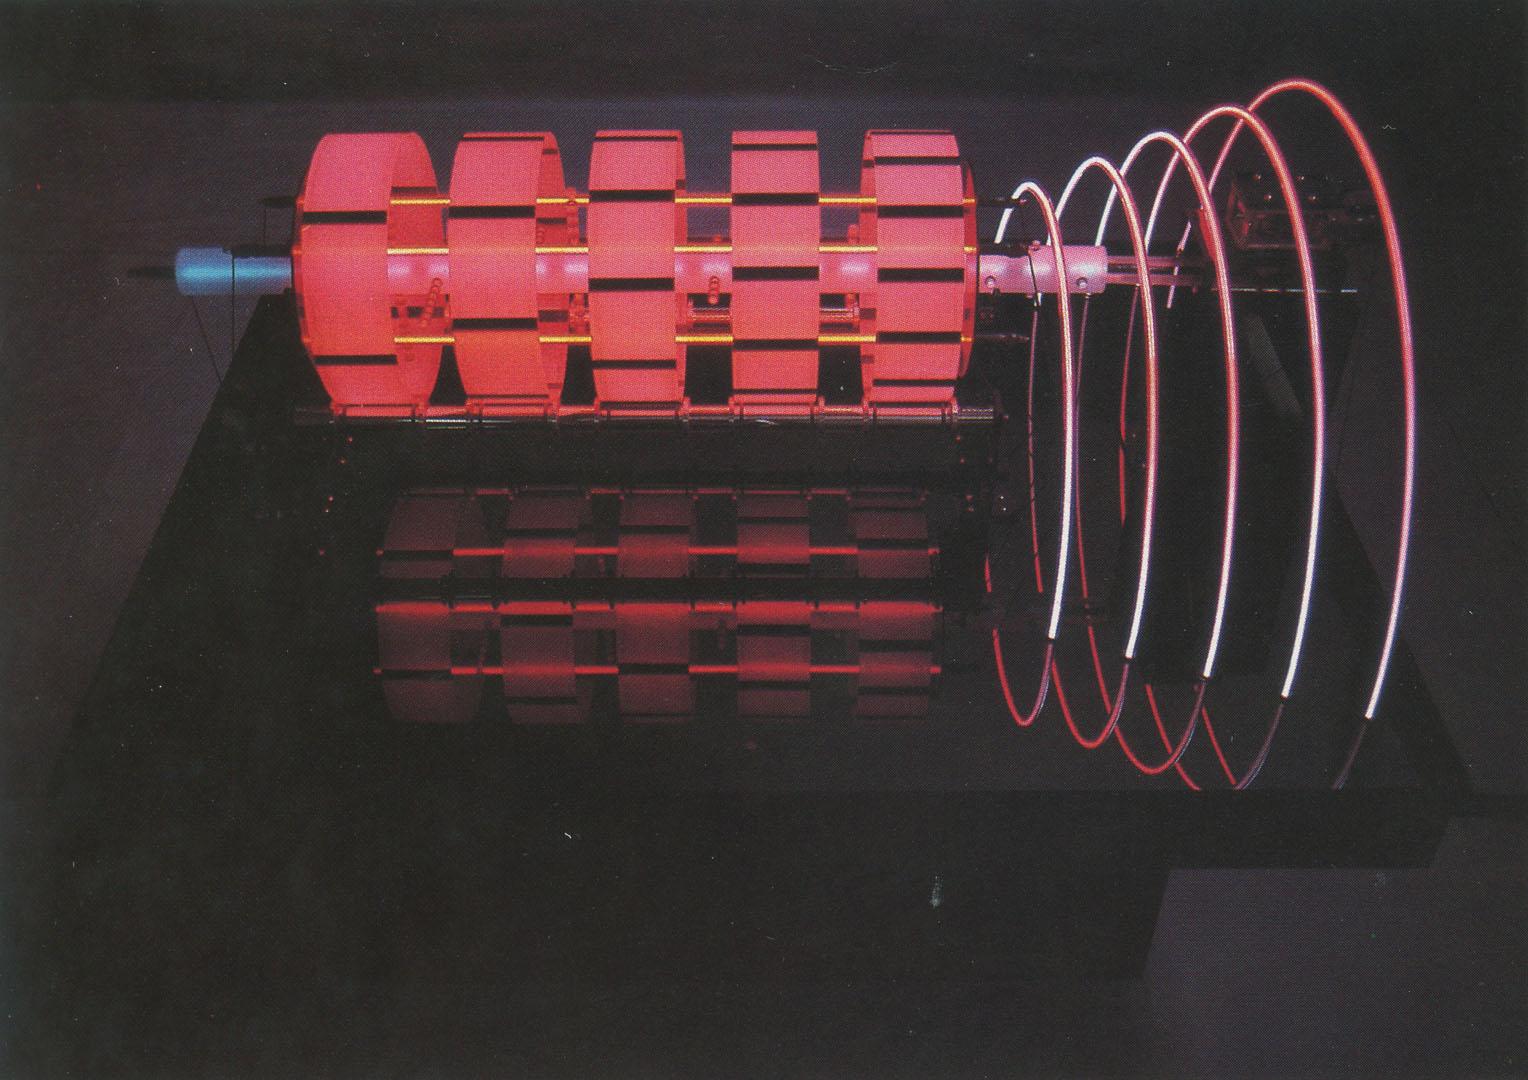 ©1984, Alan Marshall, Luminous Erototron